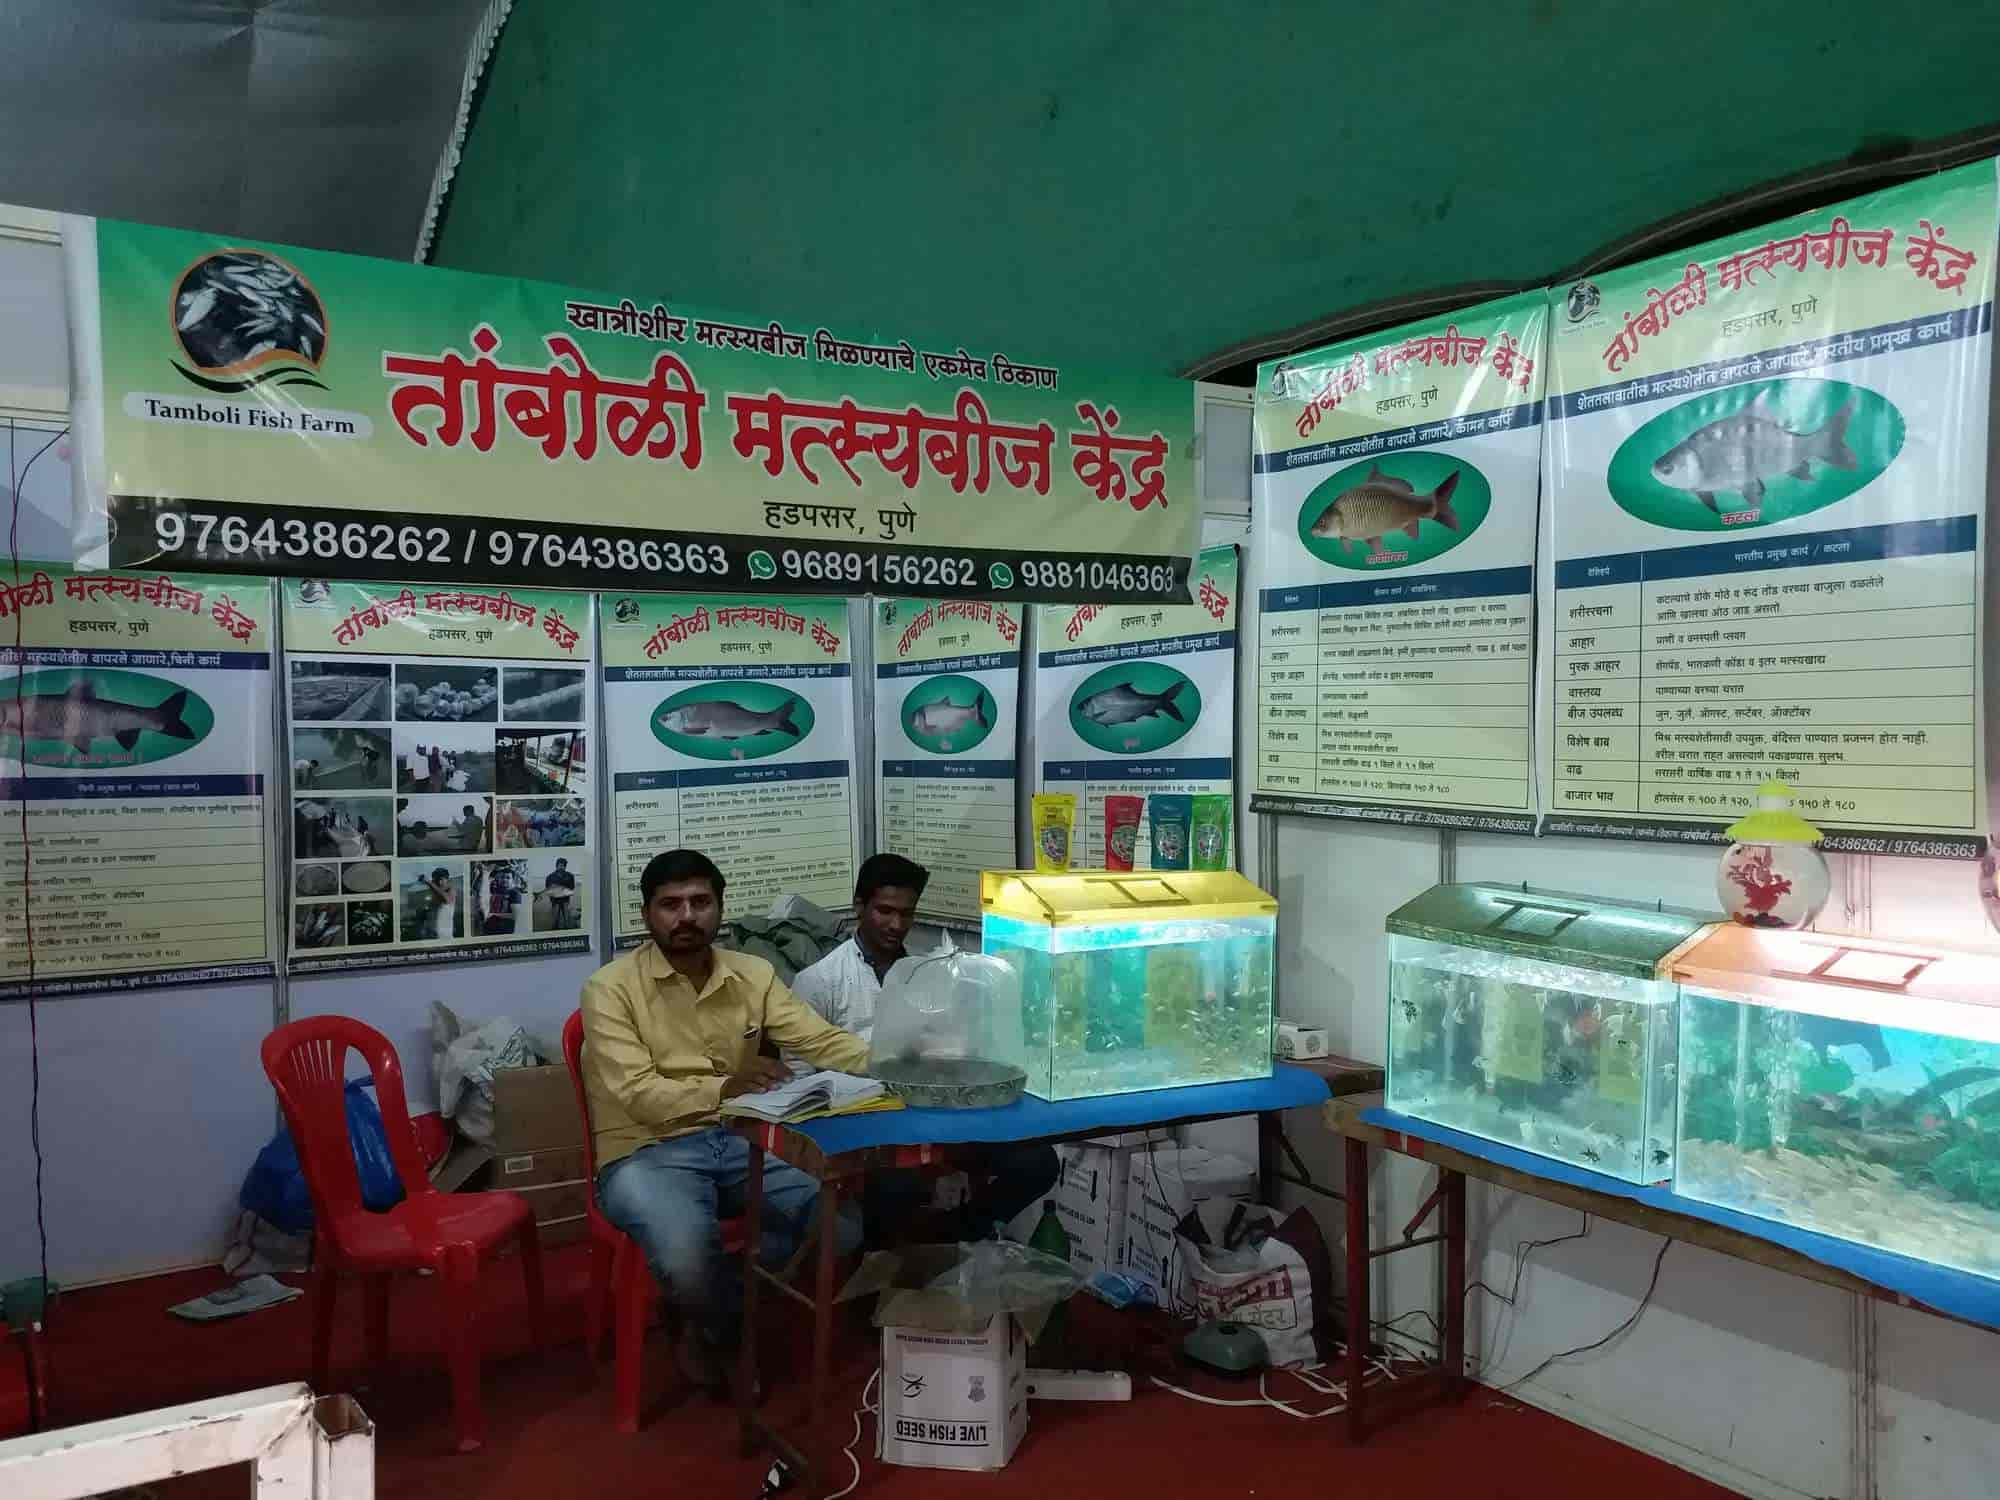 Tamboli Fish Seed Suppliers, Hadapsar - Fish Seed